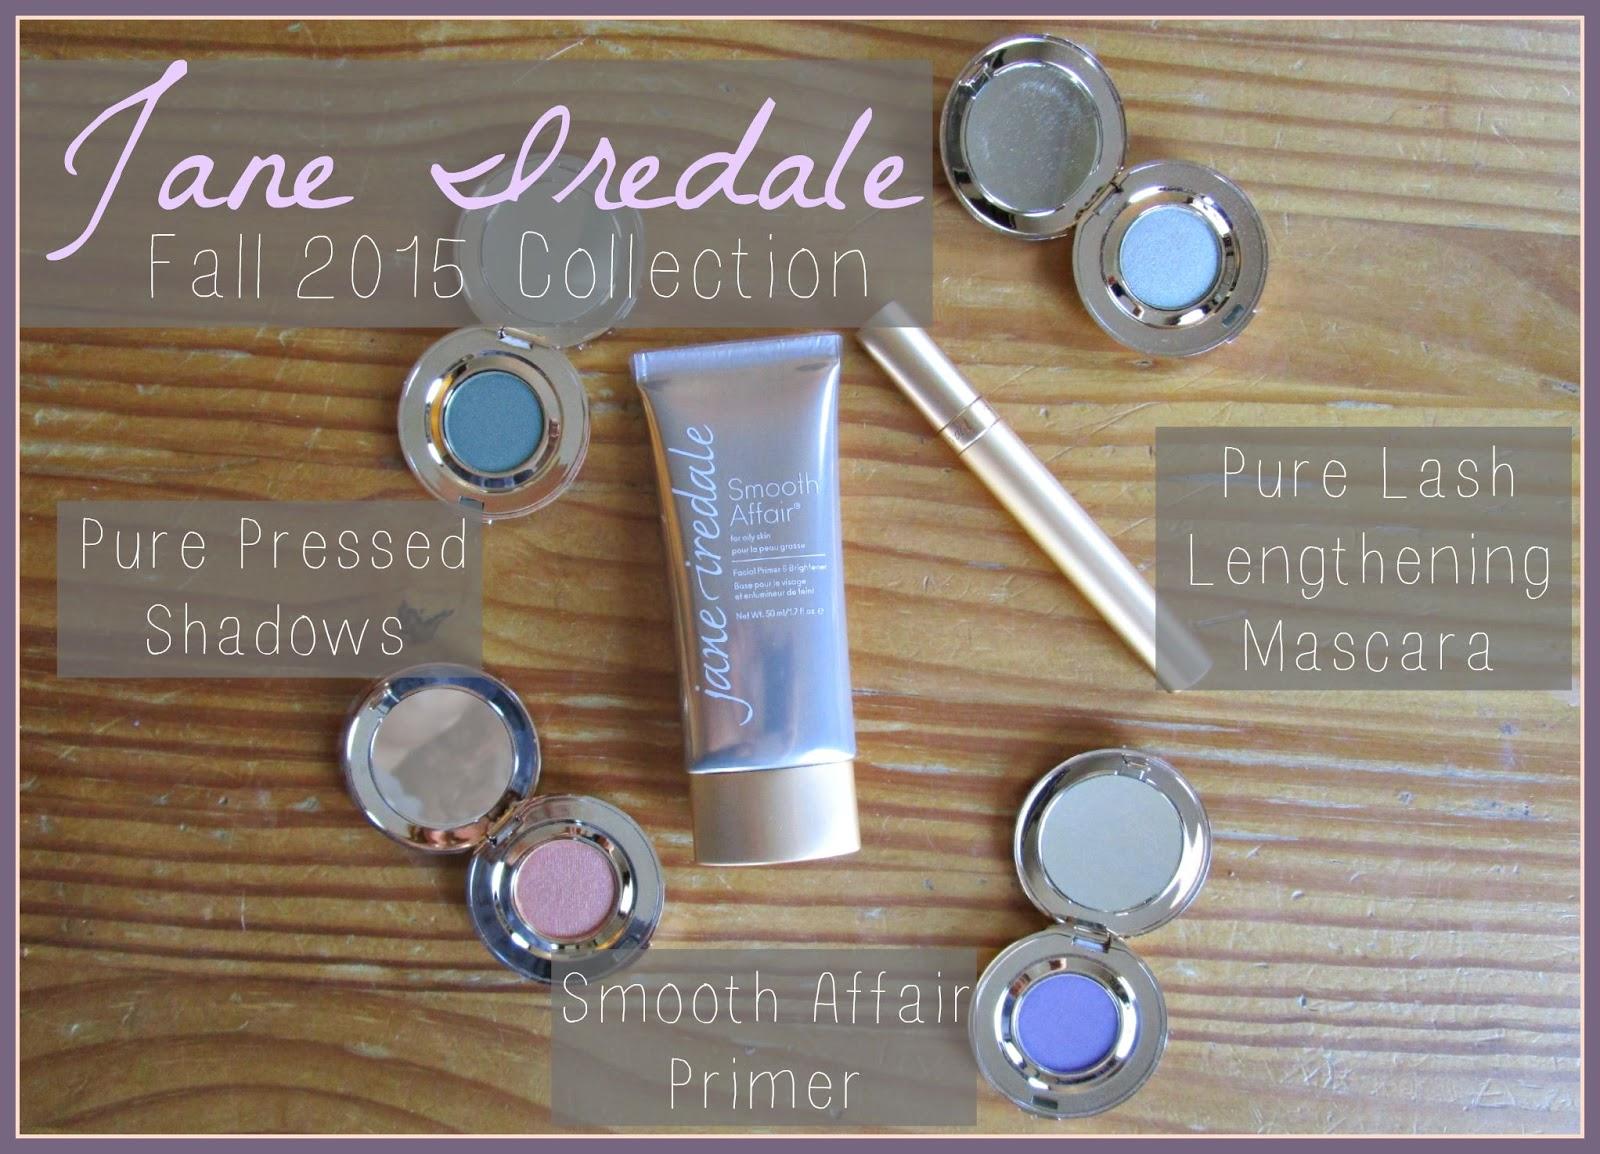 Smooth Affair Eye Shadow/Primer by Jane Iredale #21